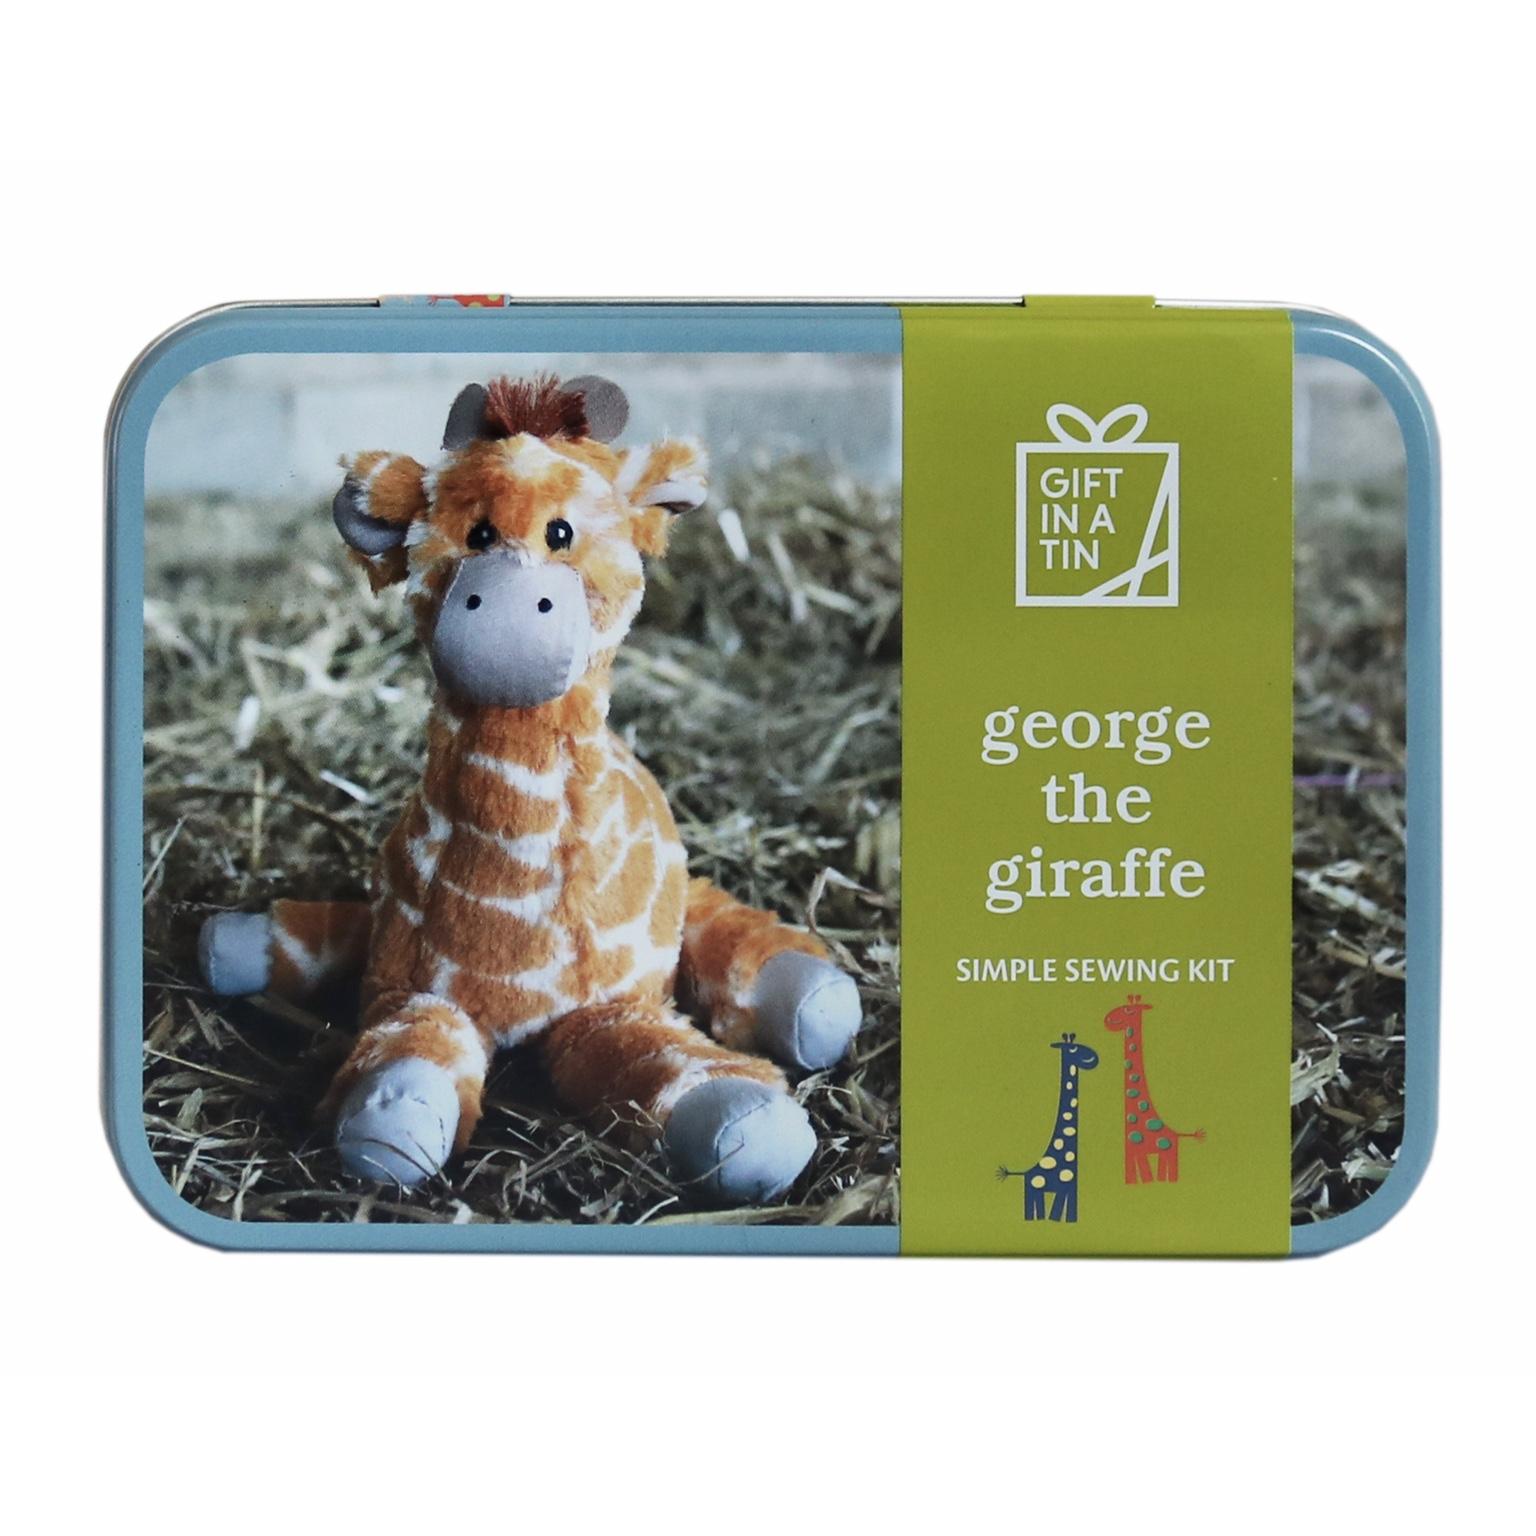 'George the Giraffe' Gift in a Tin